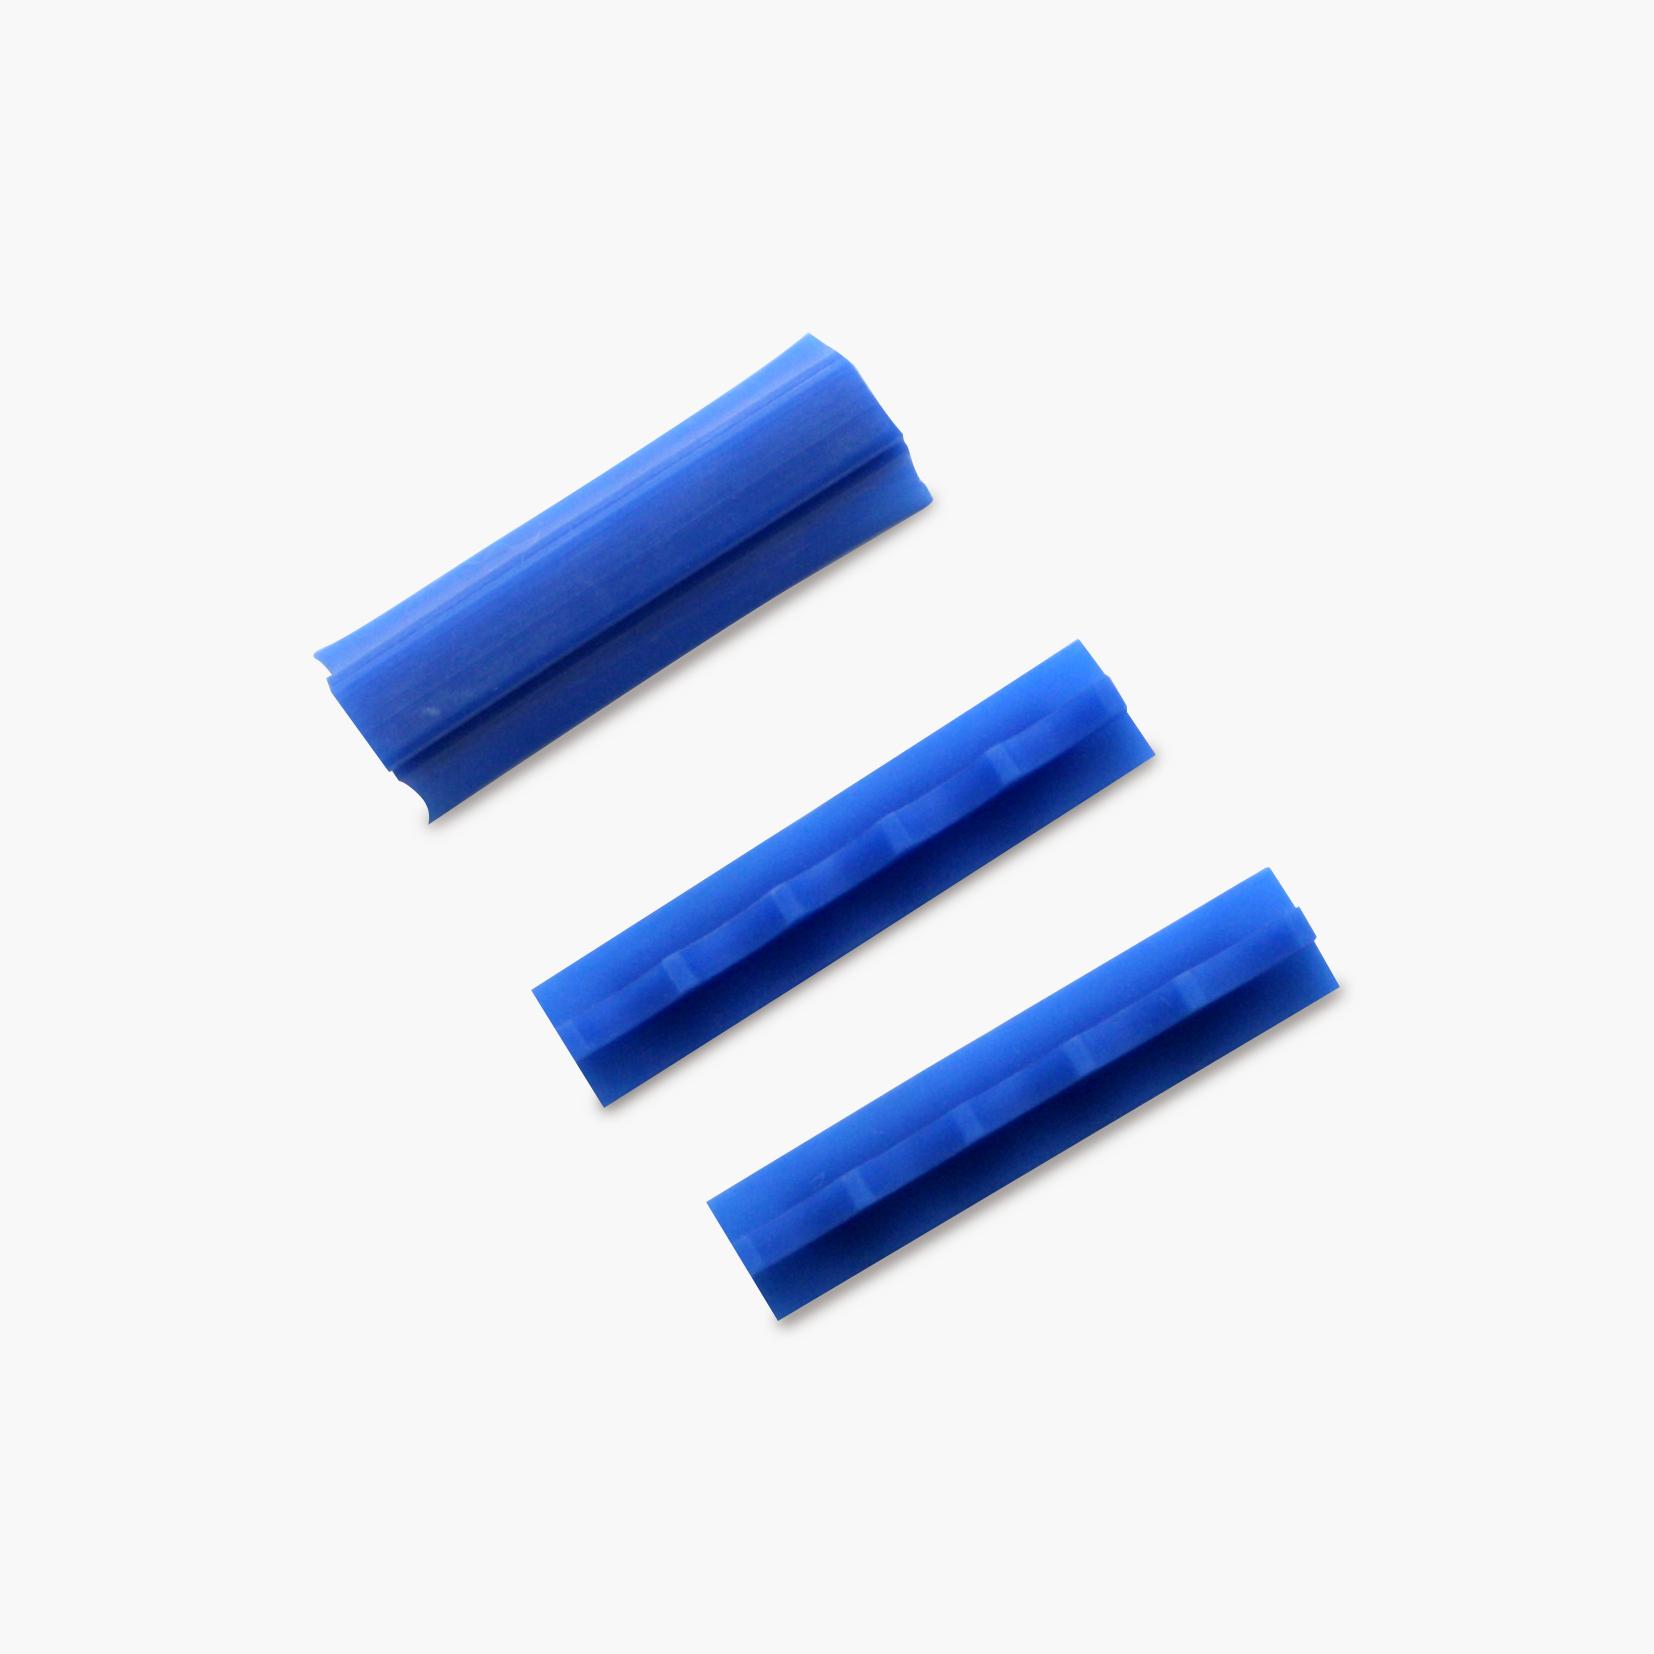 Silicone strip 1-4_29999_1_ 1200 x 1200